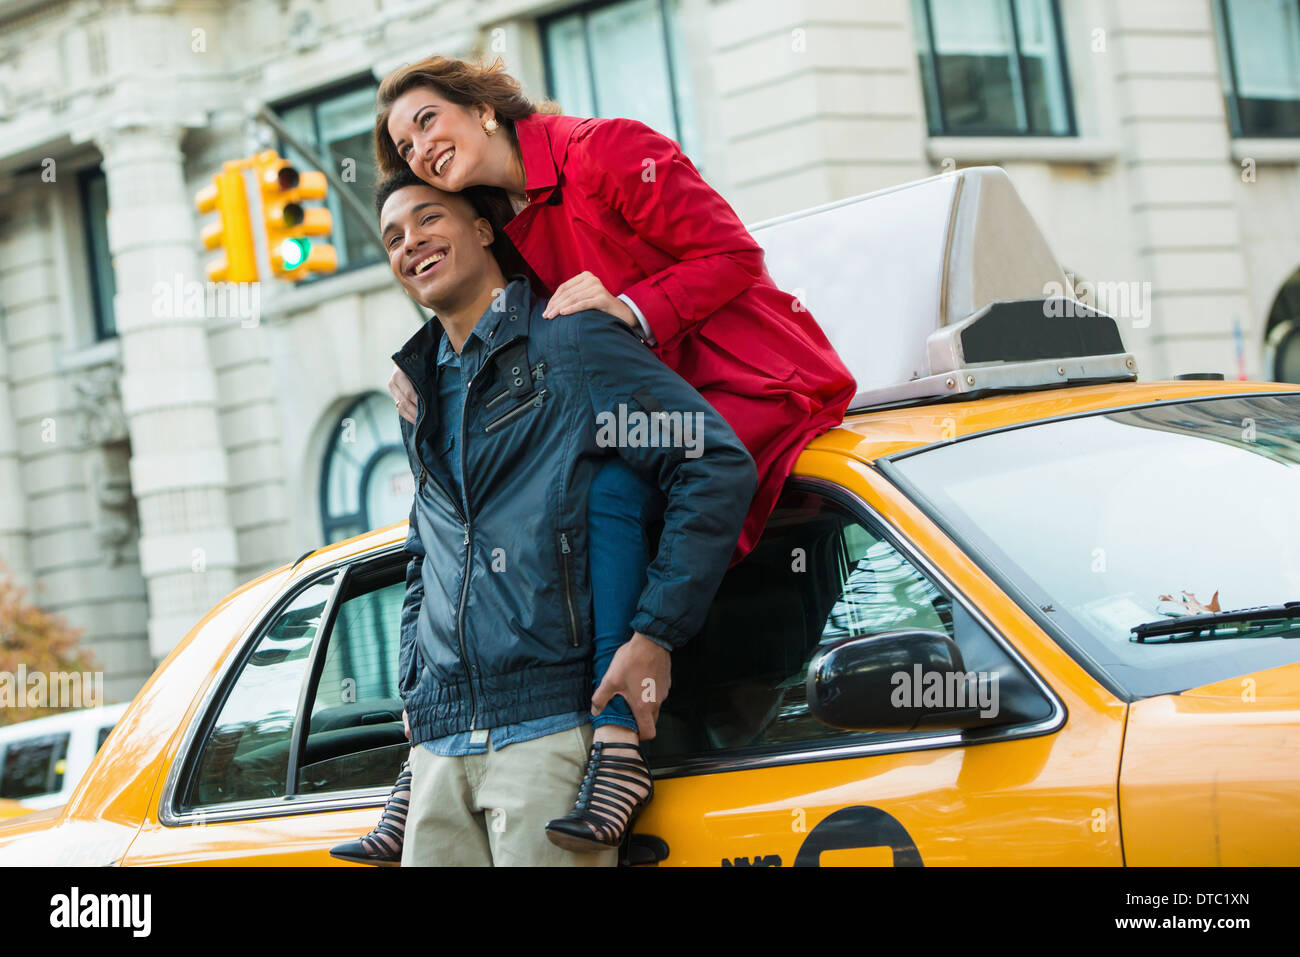 Young tourist couple with yellow cab, New York City, USA - Stock Image